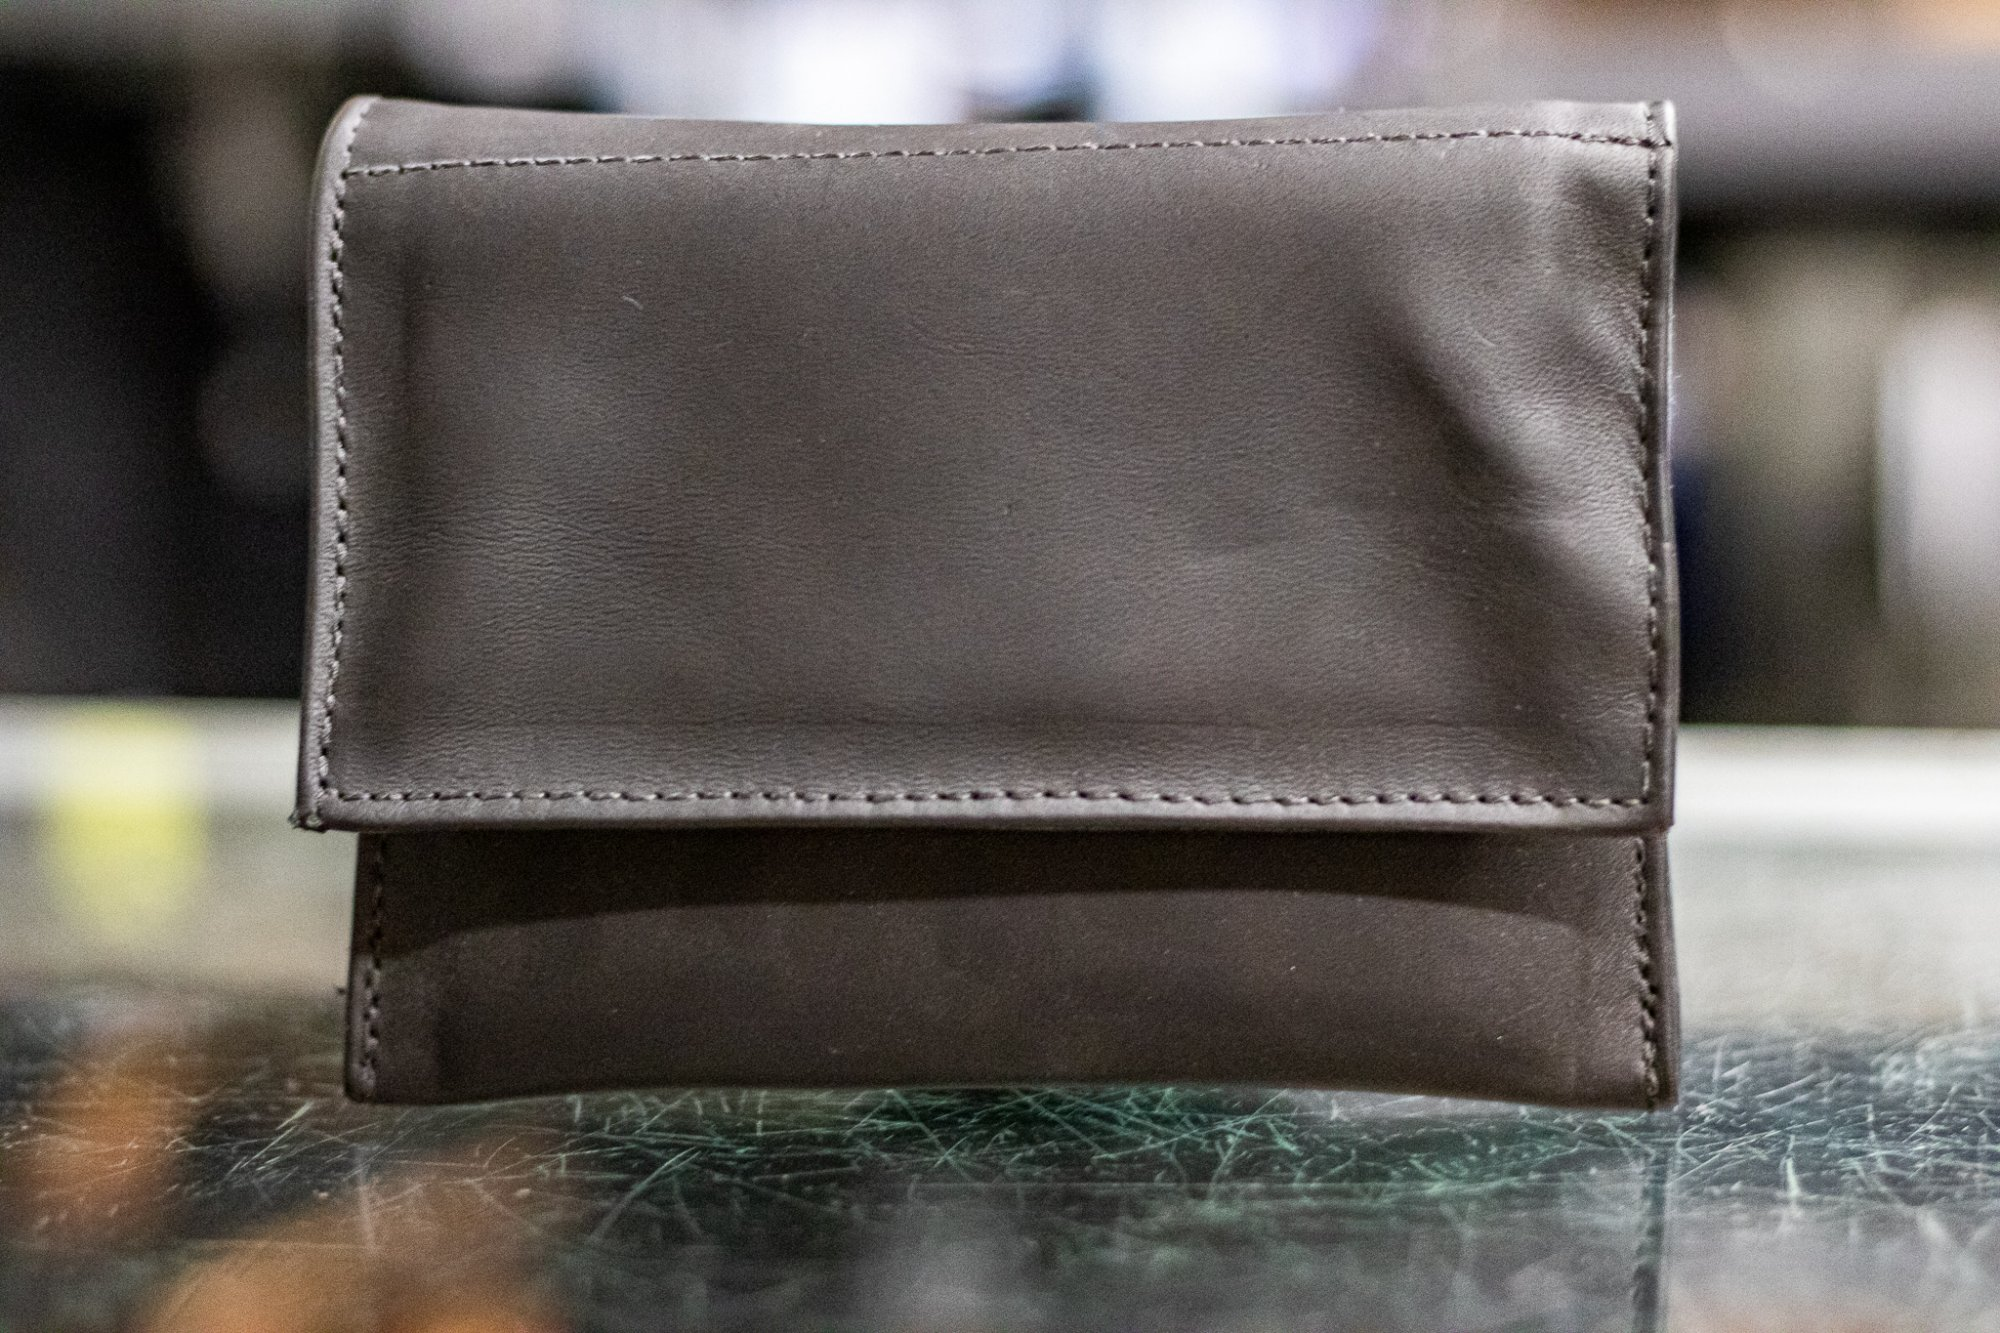 Torpedo Bag 2x Mouthpiece Holster - Trombone (DEMO) - Black Leather